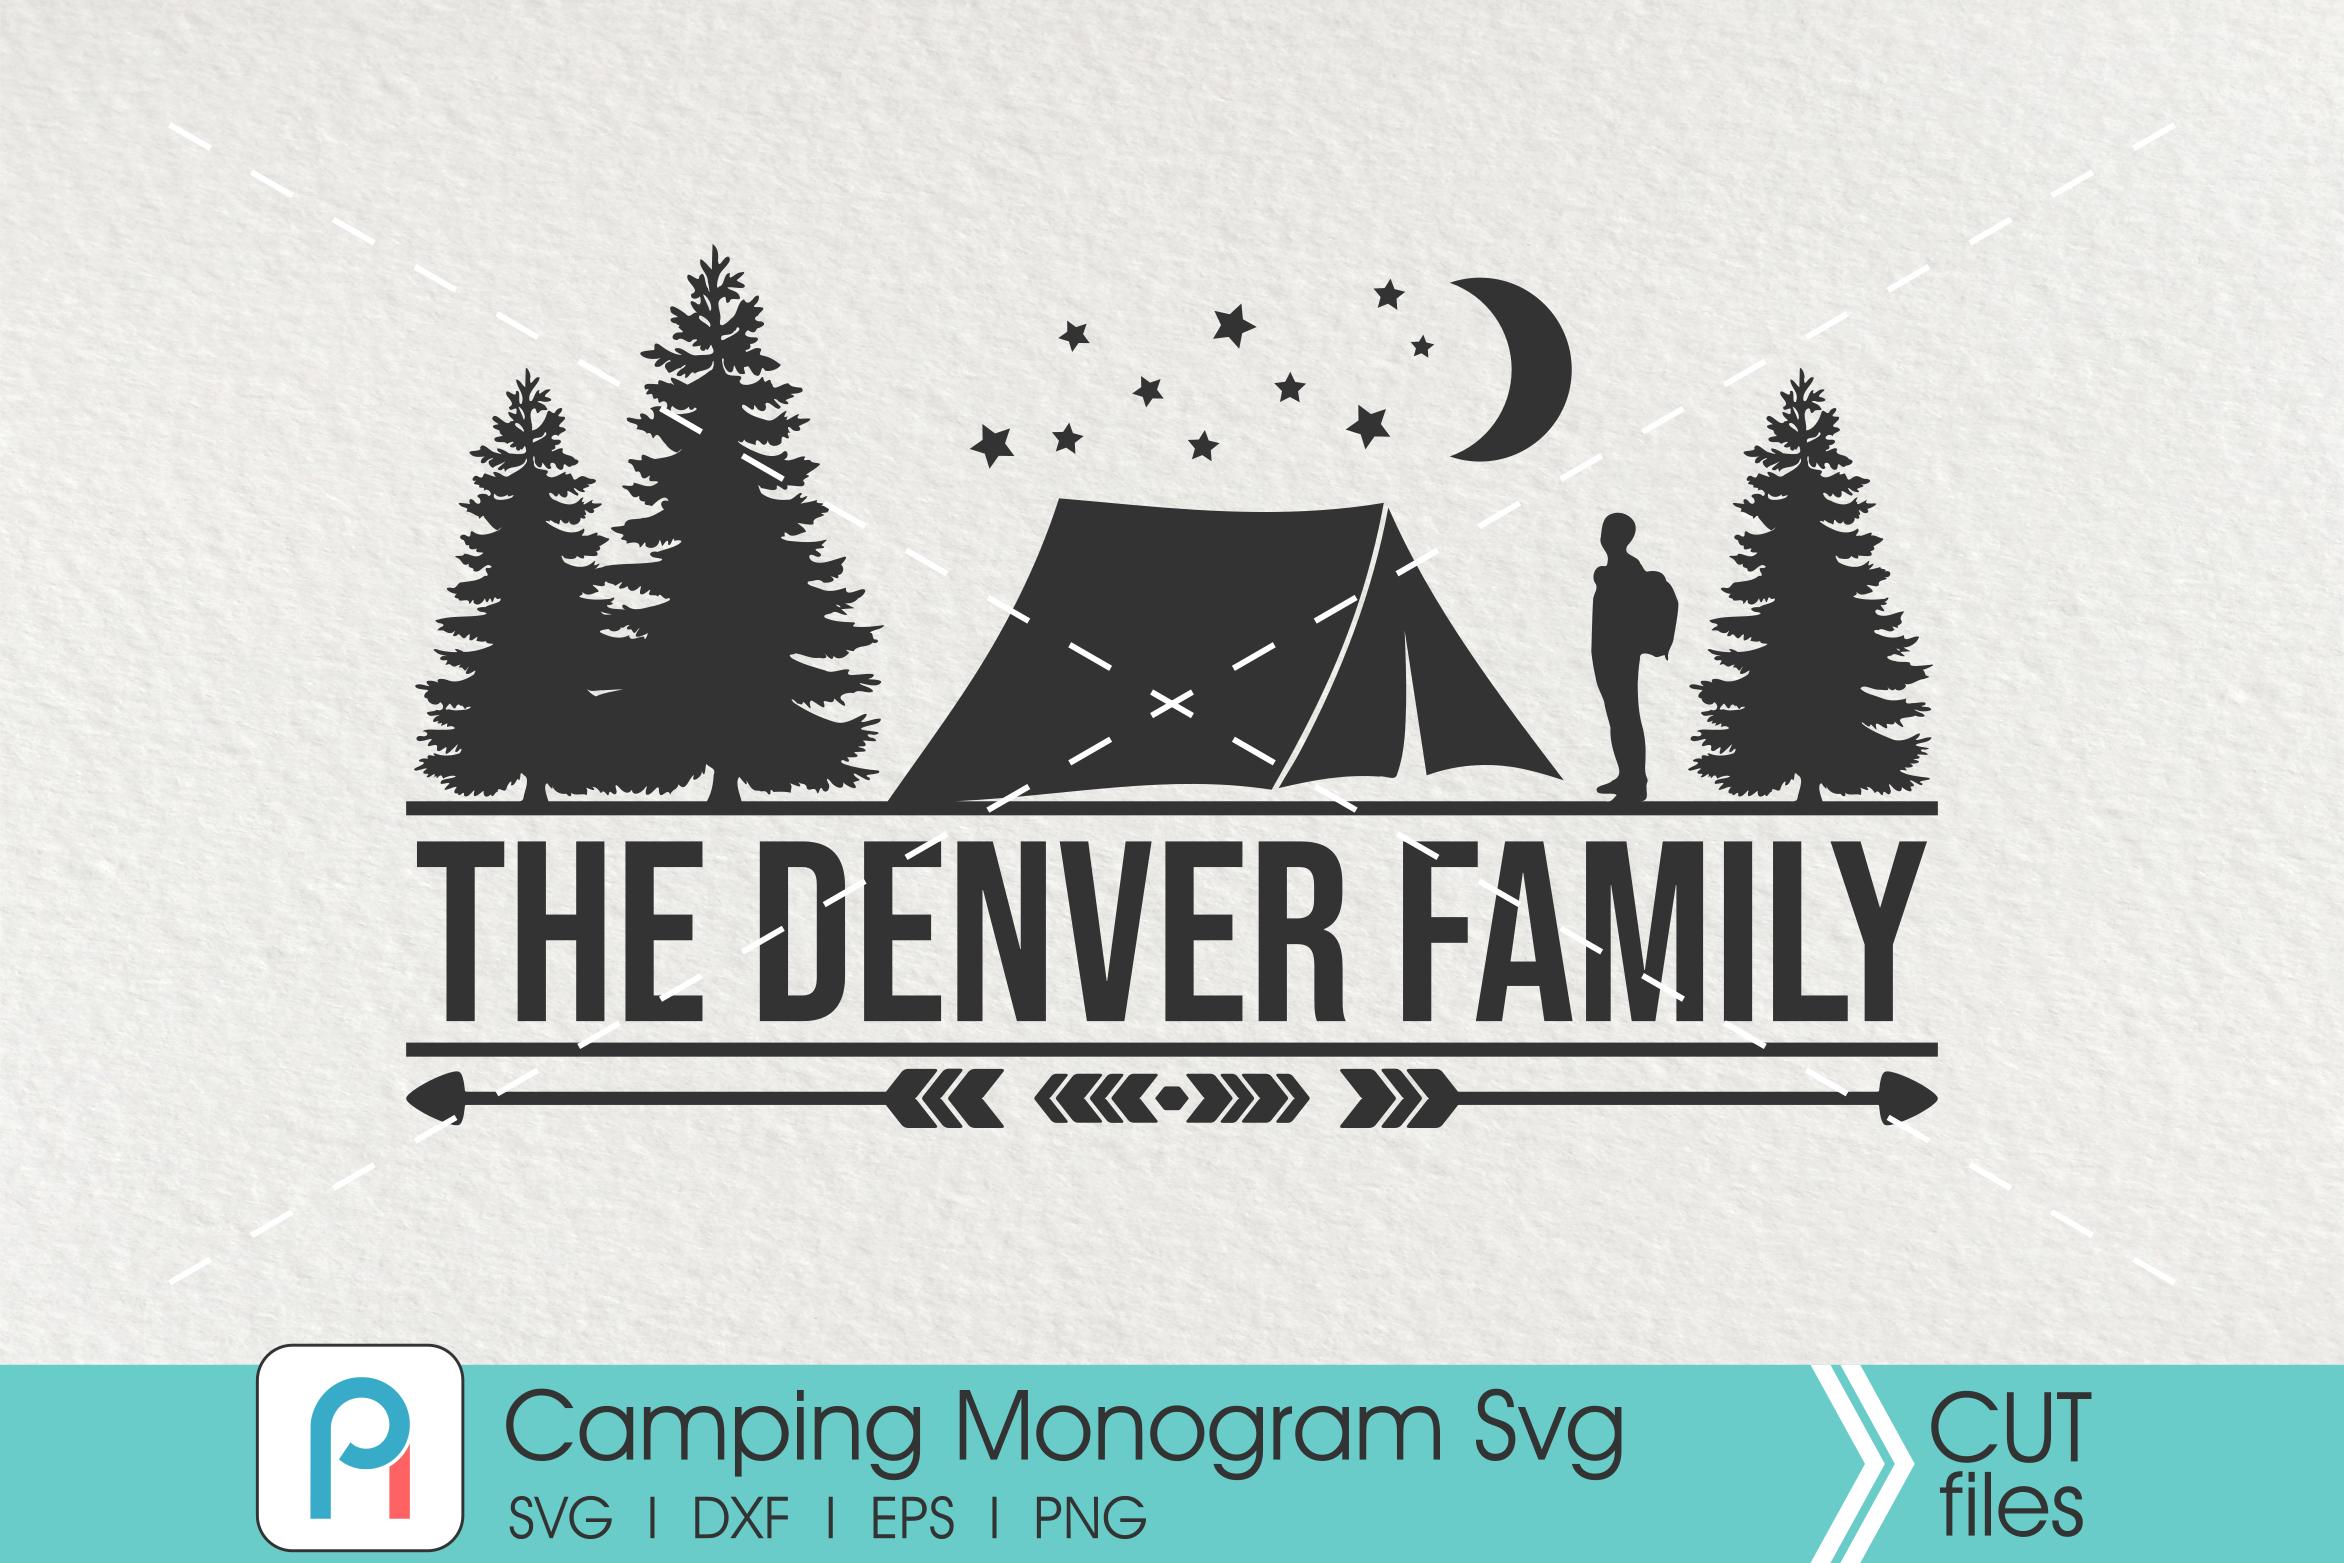 Camping Monogram Svg Camper Svg Camping Clip Art By Pinoyart